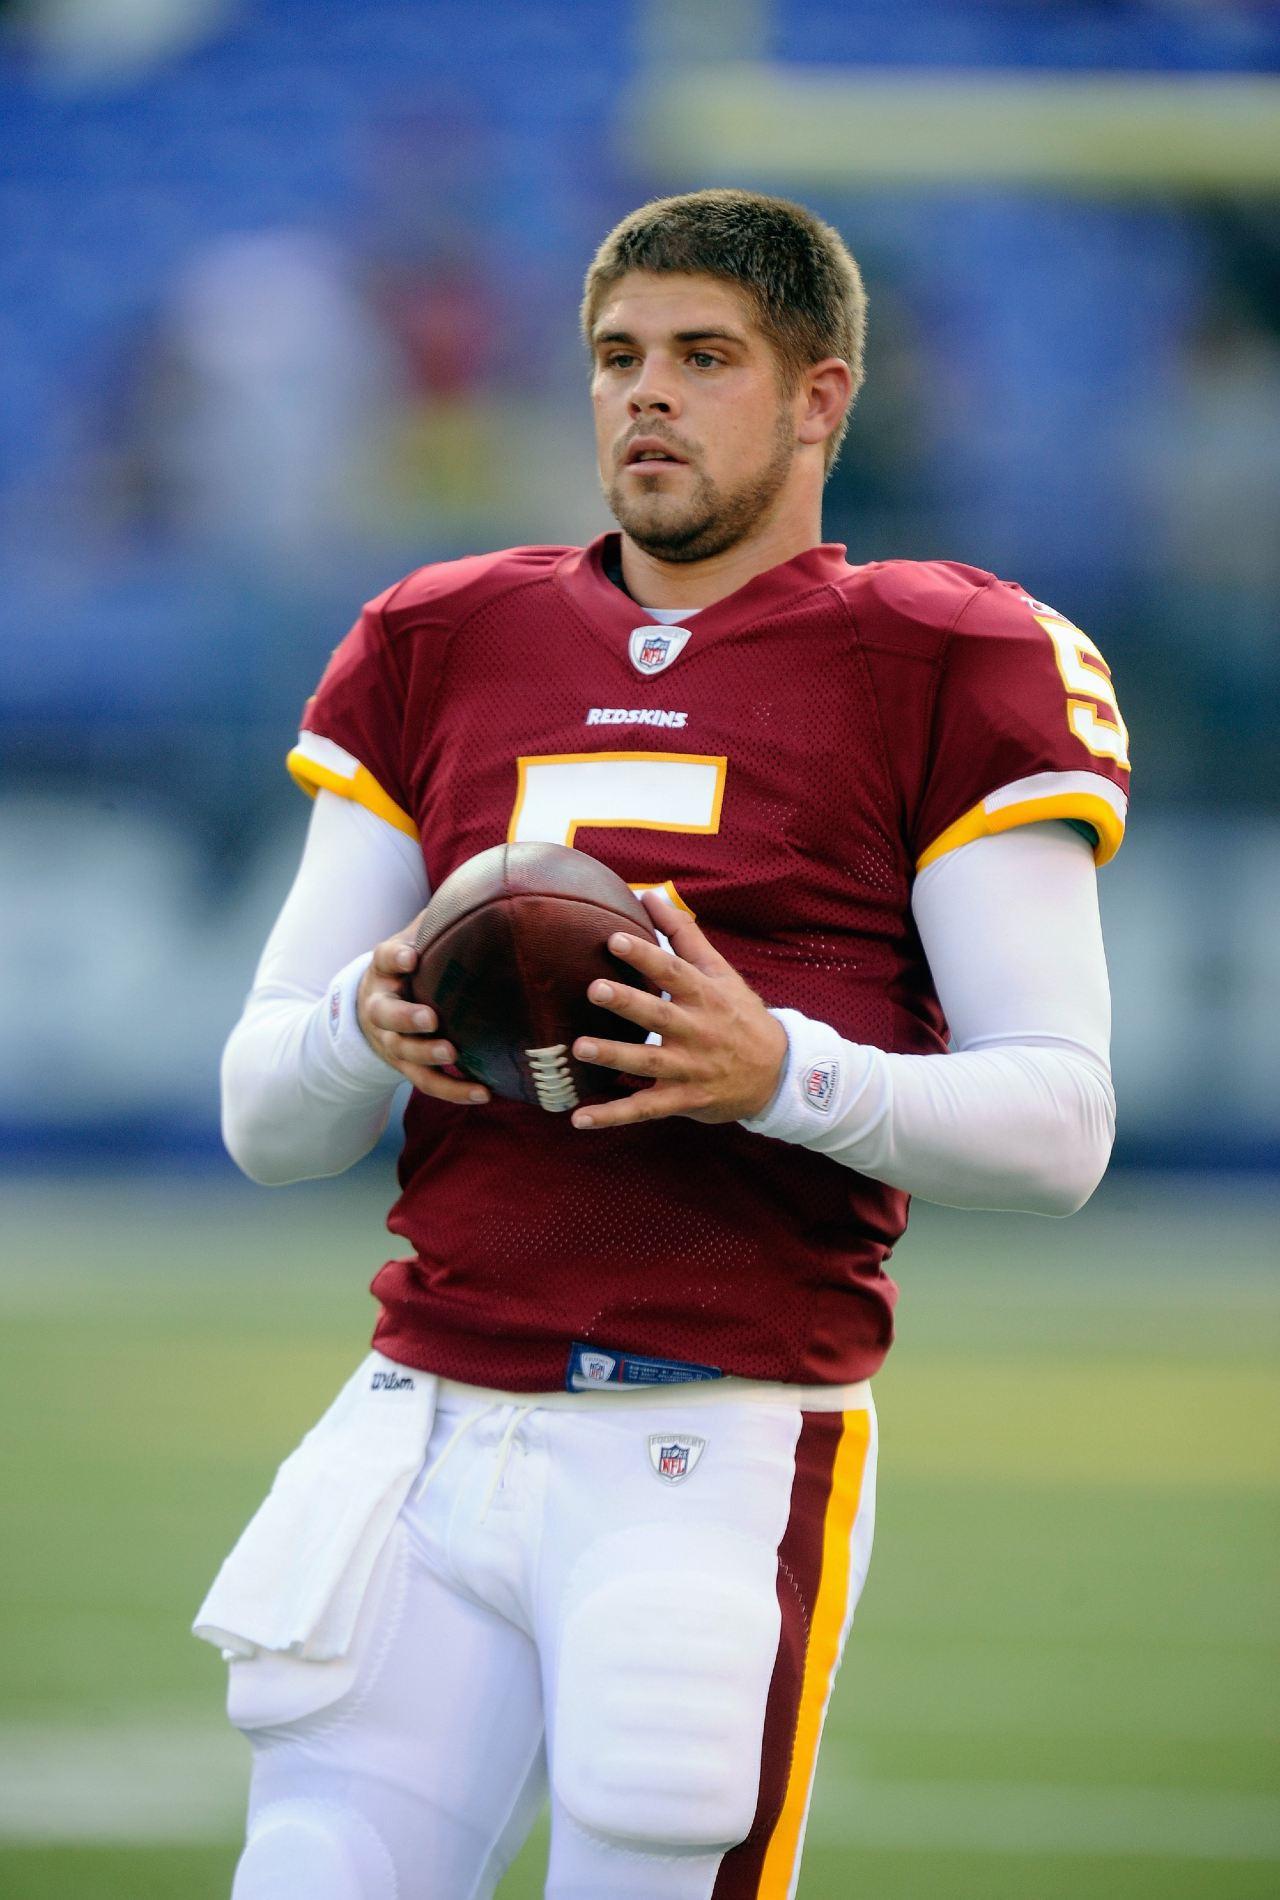 Colt Brennan mariscal NFL muere 37 años